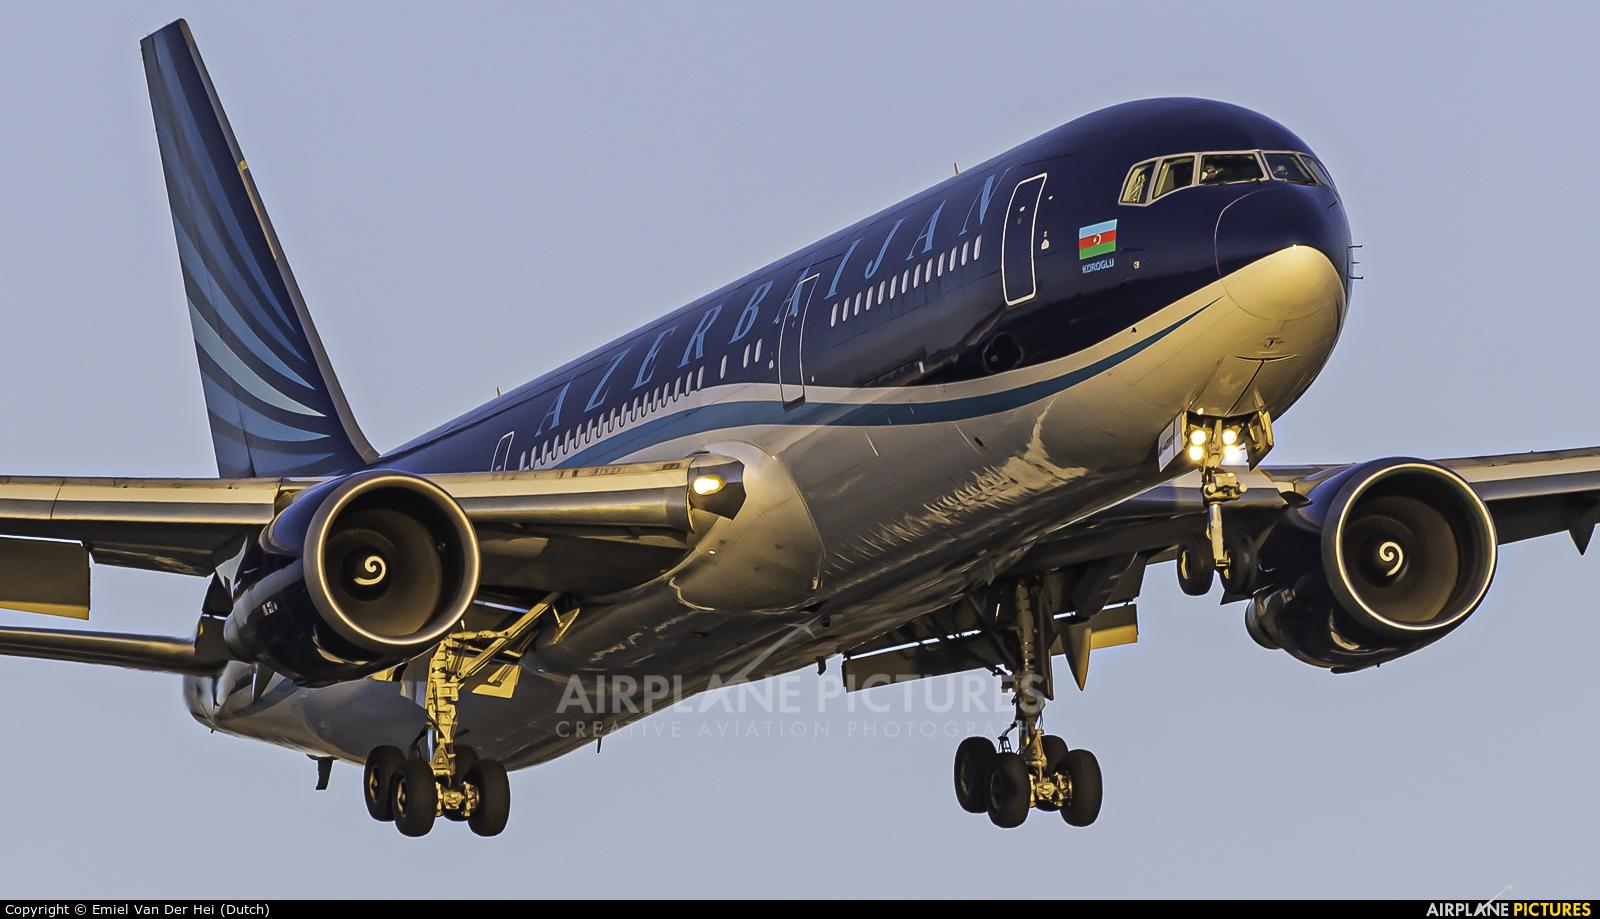 Azerbaijan Airlines 4K-AZ82 aircraft at Amsterdam - Schiphol